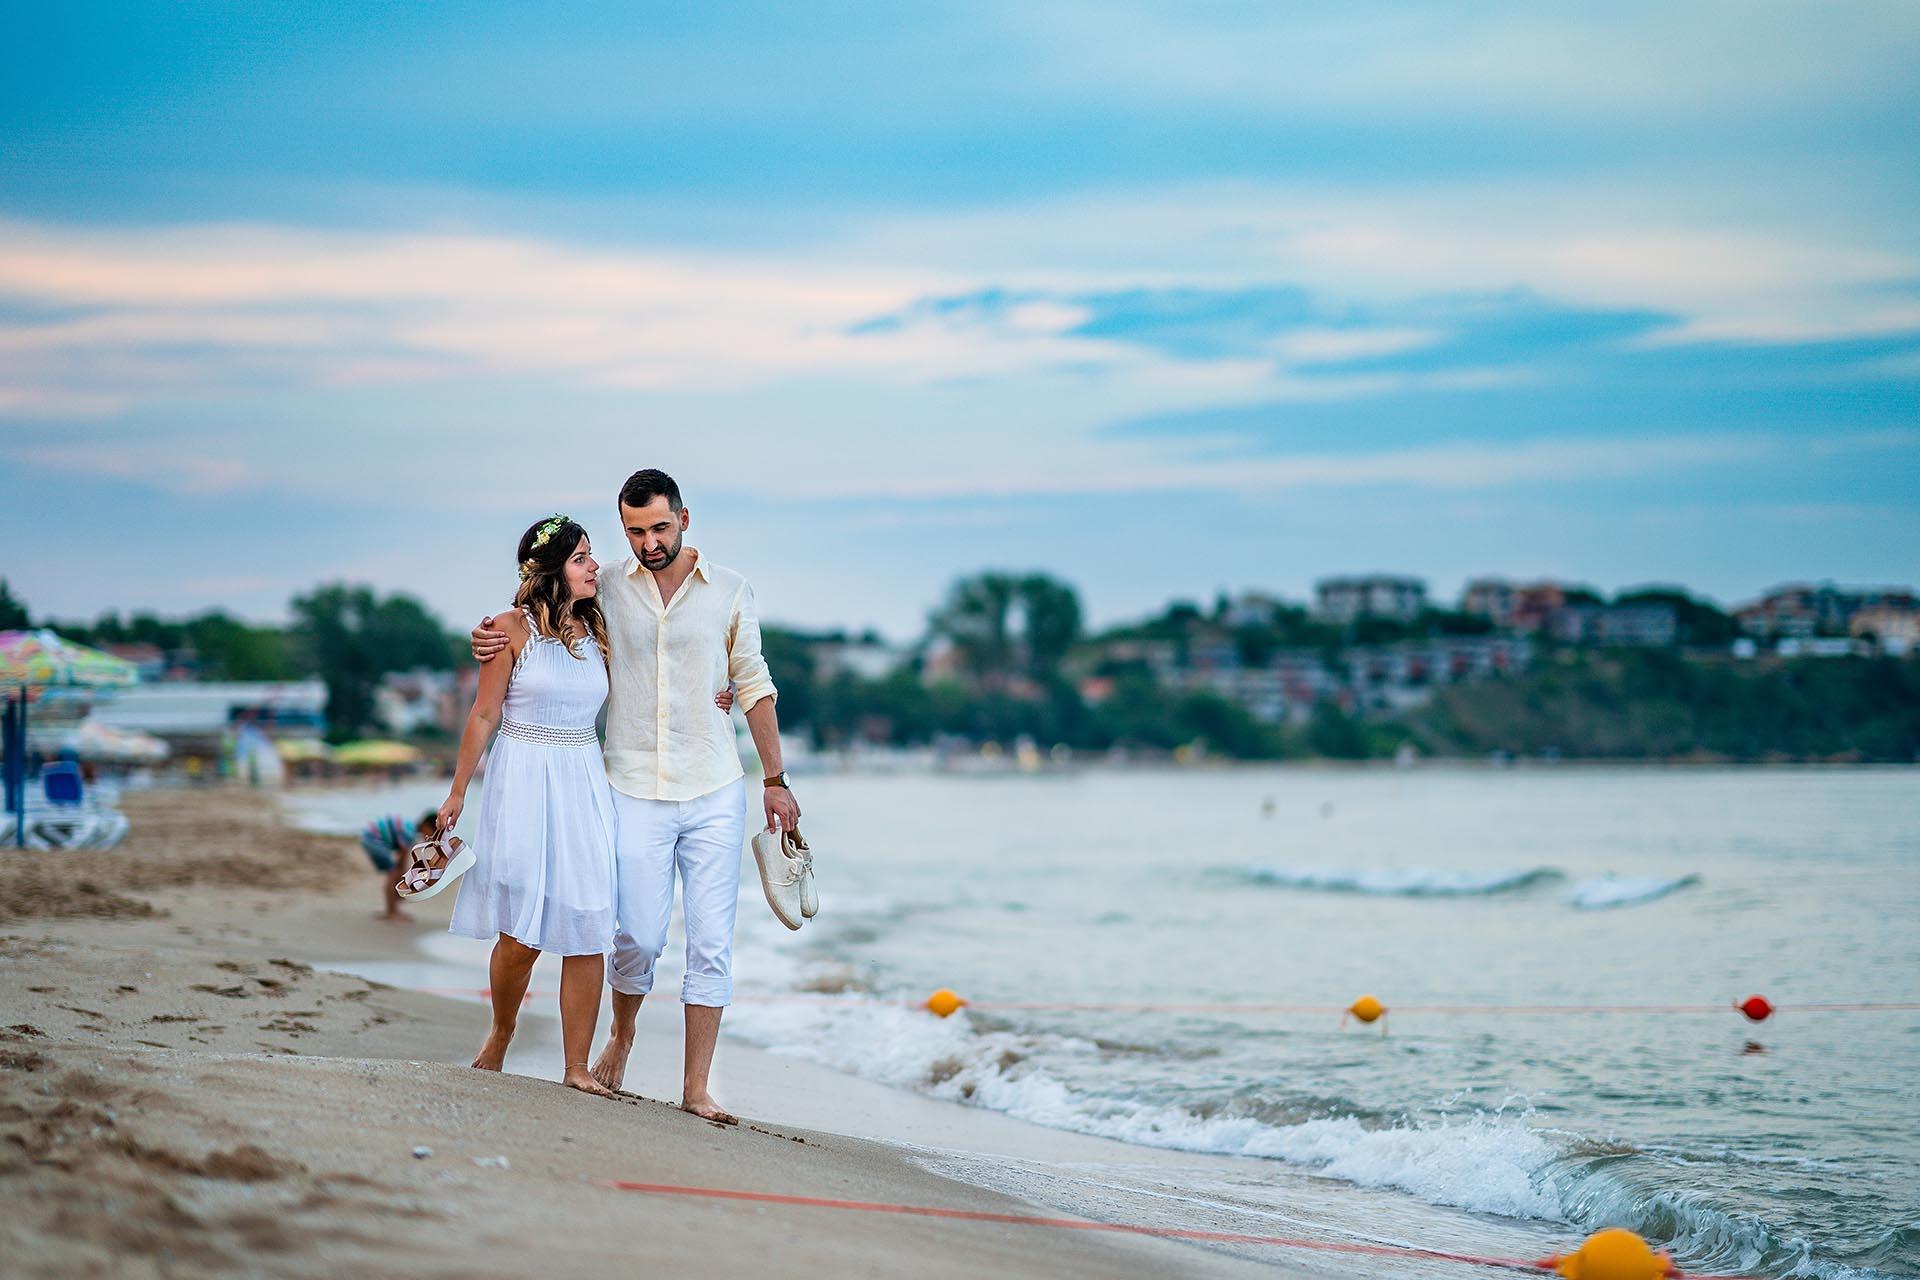 Bulgaria Beach Wedding Portrait | The bride and groom stroll down the beach